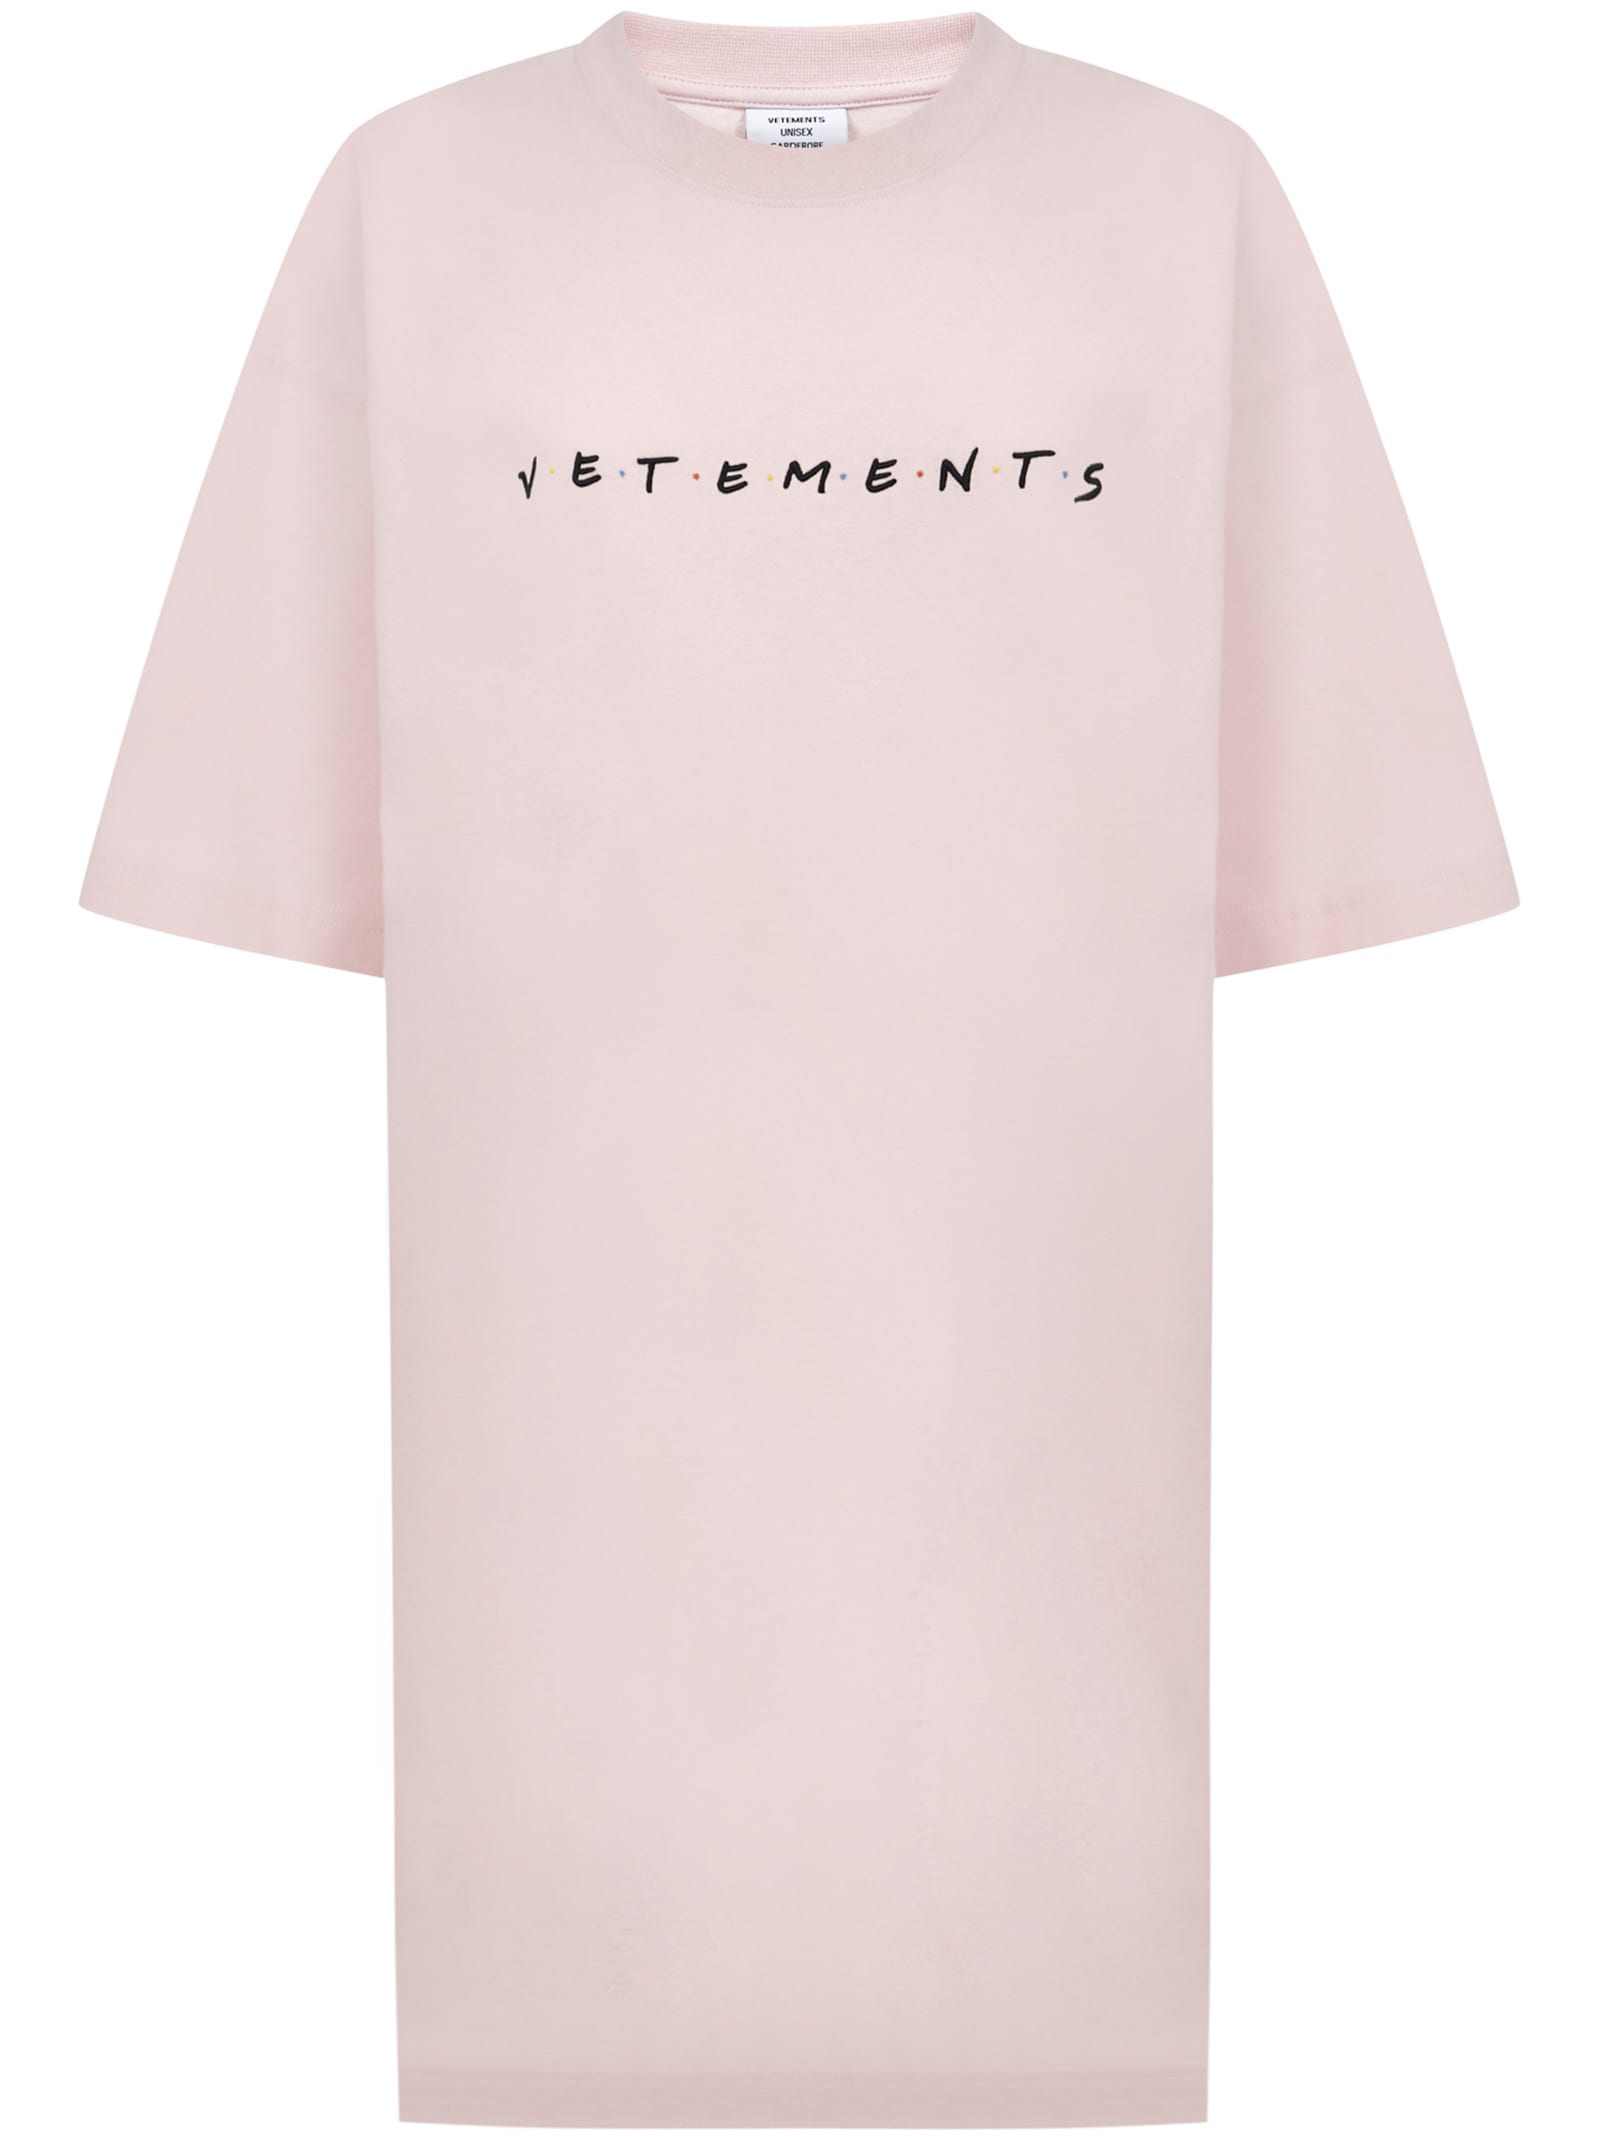 Vetements VETEMENTS T-SHIRT